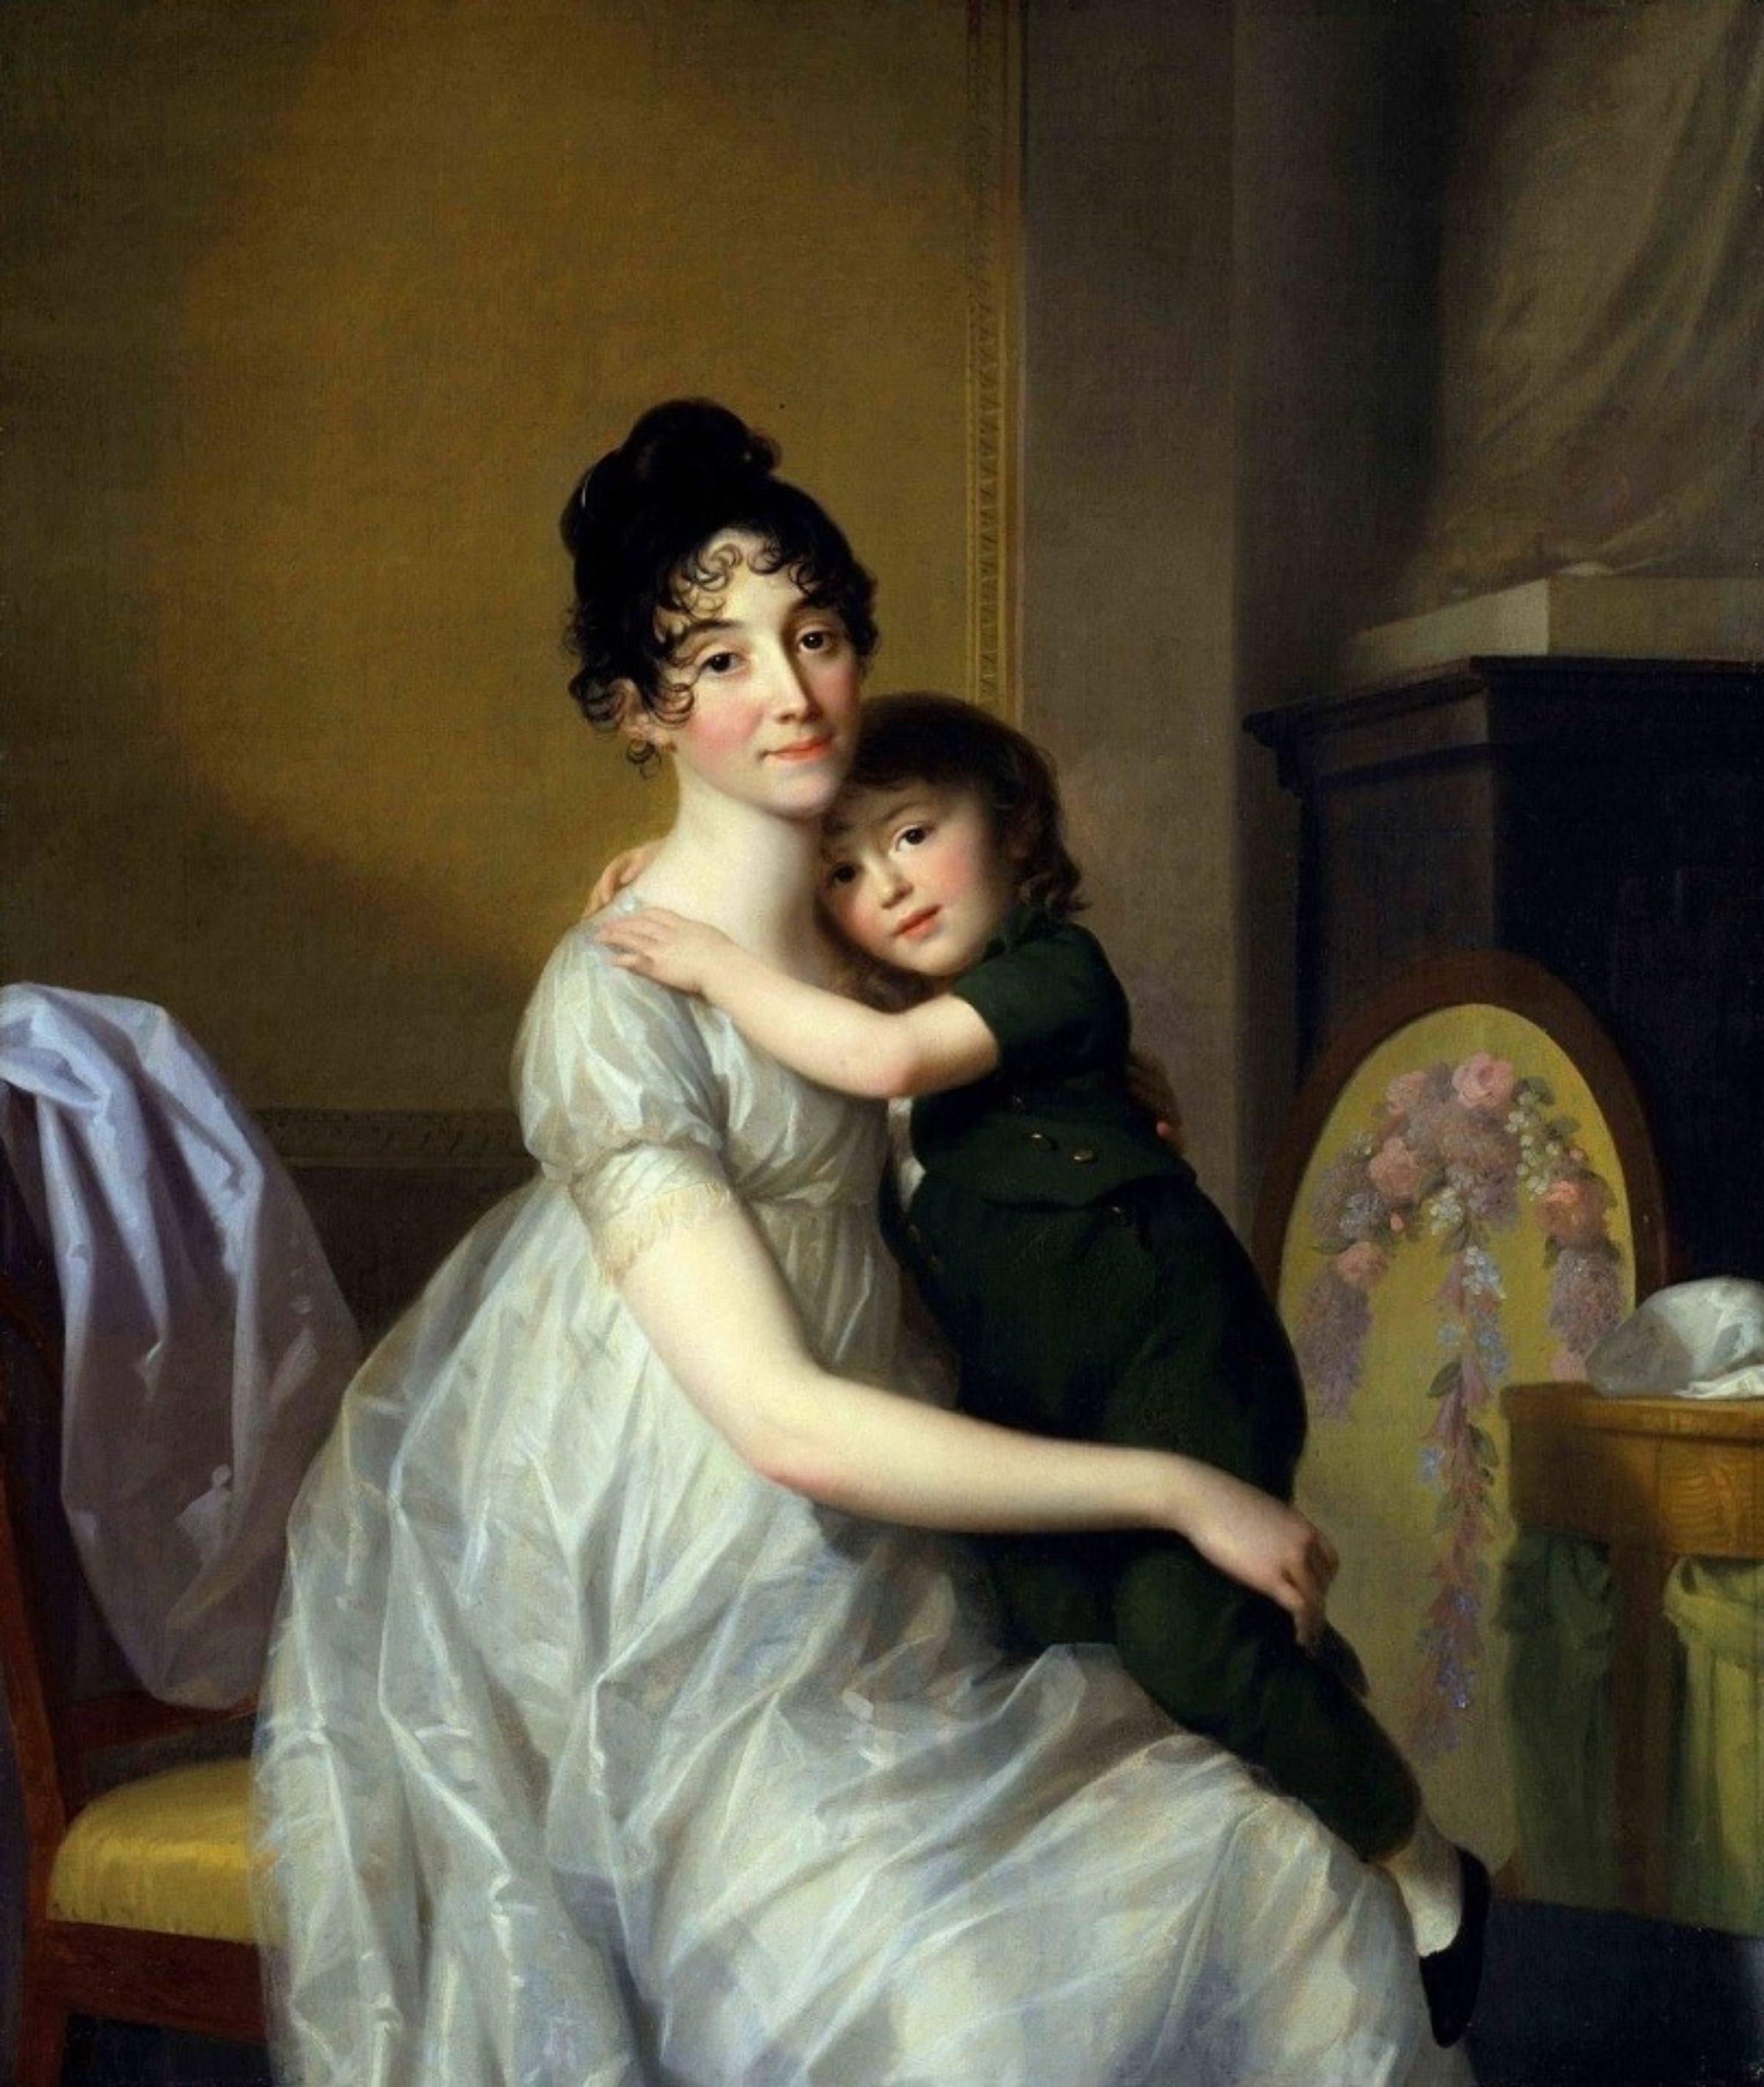 J F A Tischbein Anne Pauline Dufour Feronce met haar zoon Jean Marc Albert 1802 Museumslandschaft Hessen Kassel Gem C3 A4ldegalerie Alte Meister LR 35hxpqzxlb